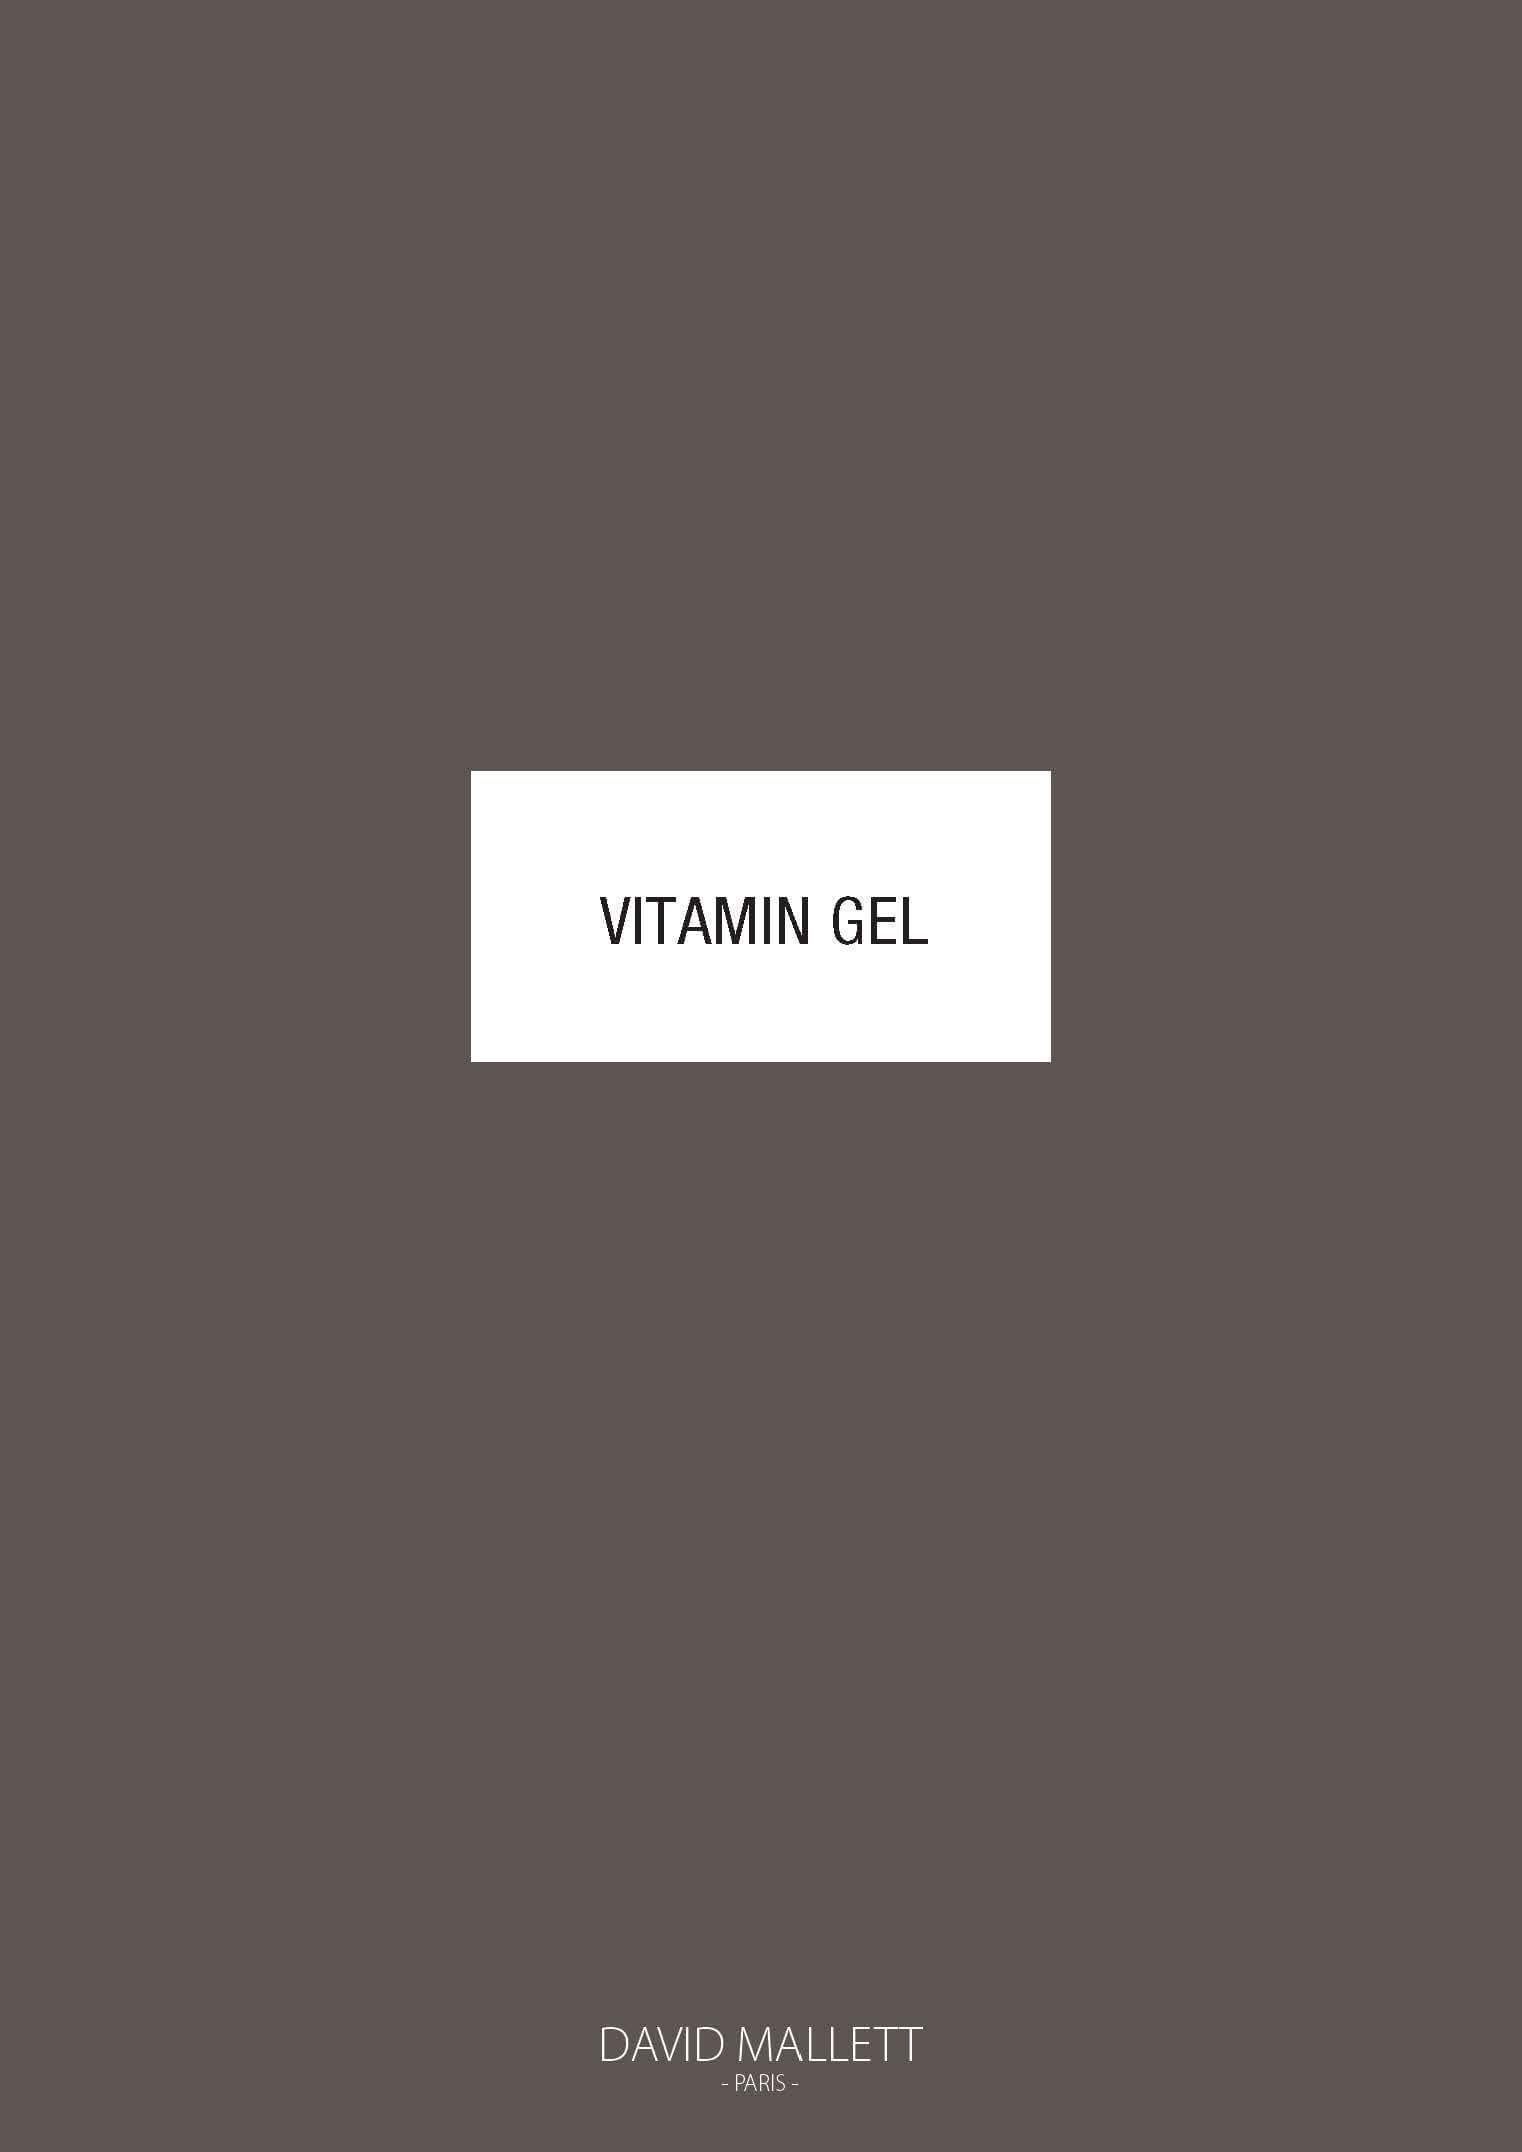 Vitamin Gel ENG